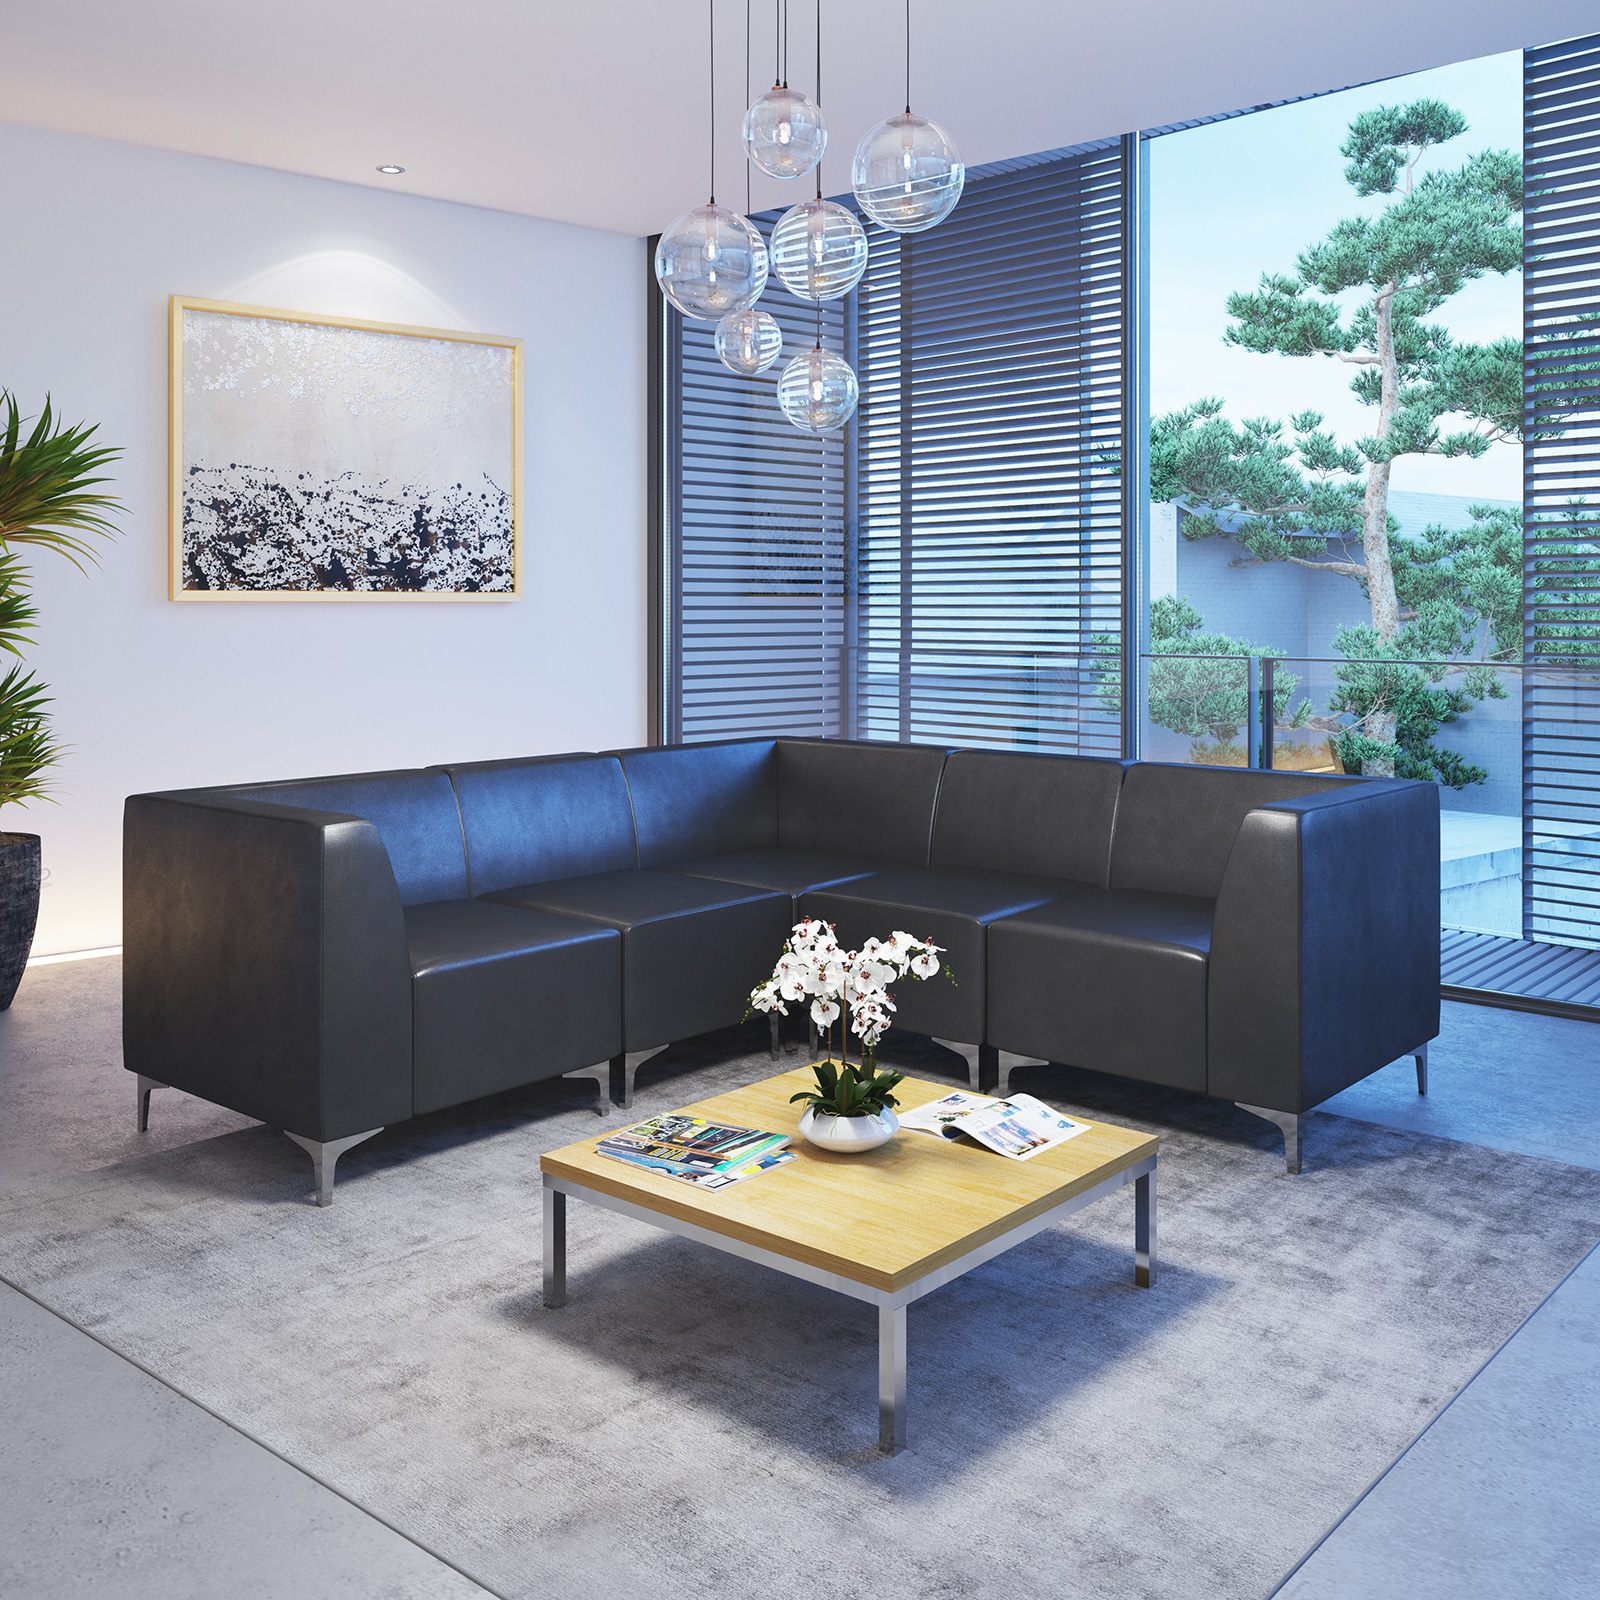 Quatro leather modular reception seating corner unit with backs - black